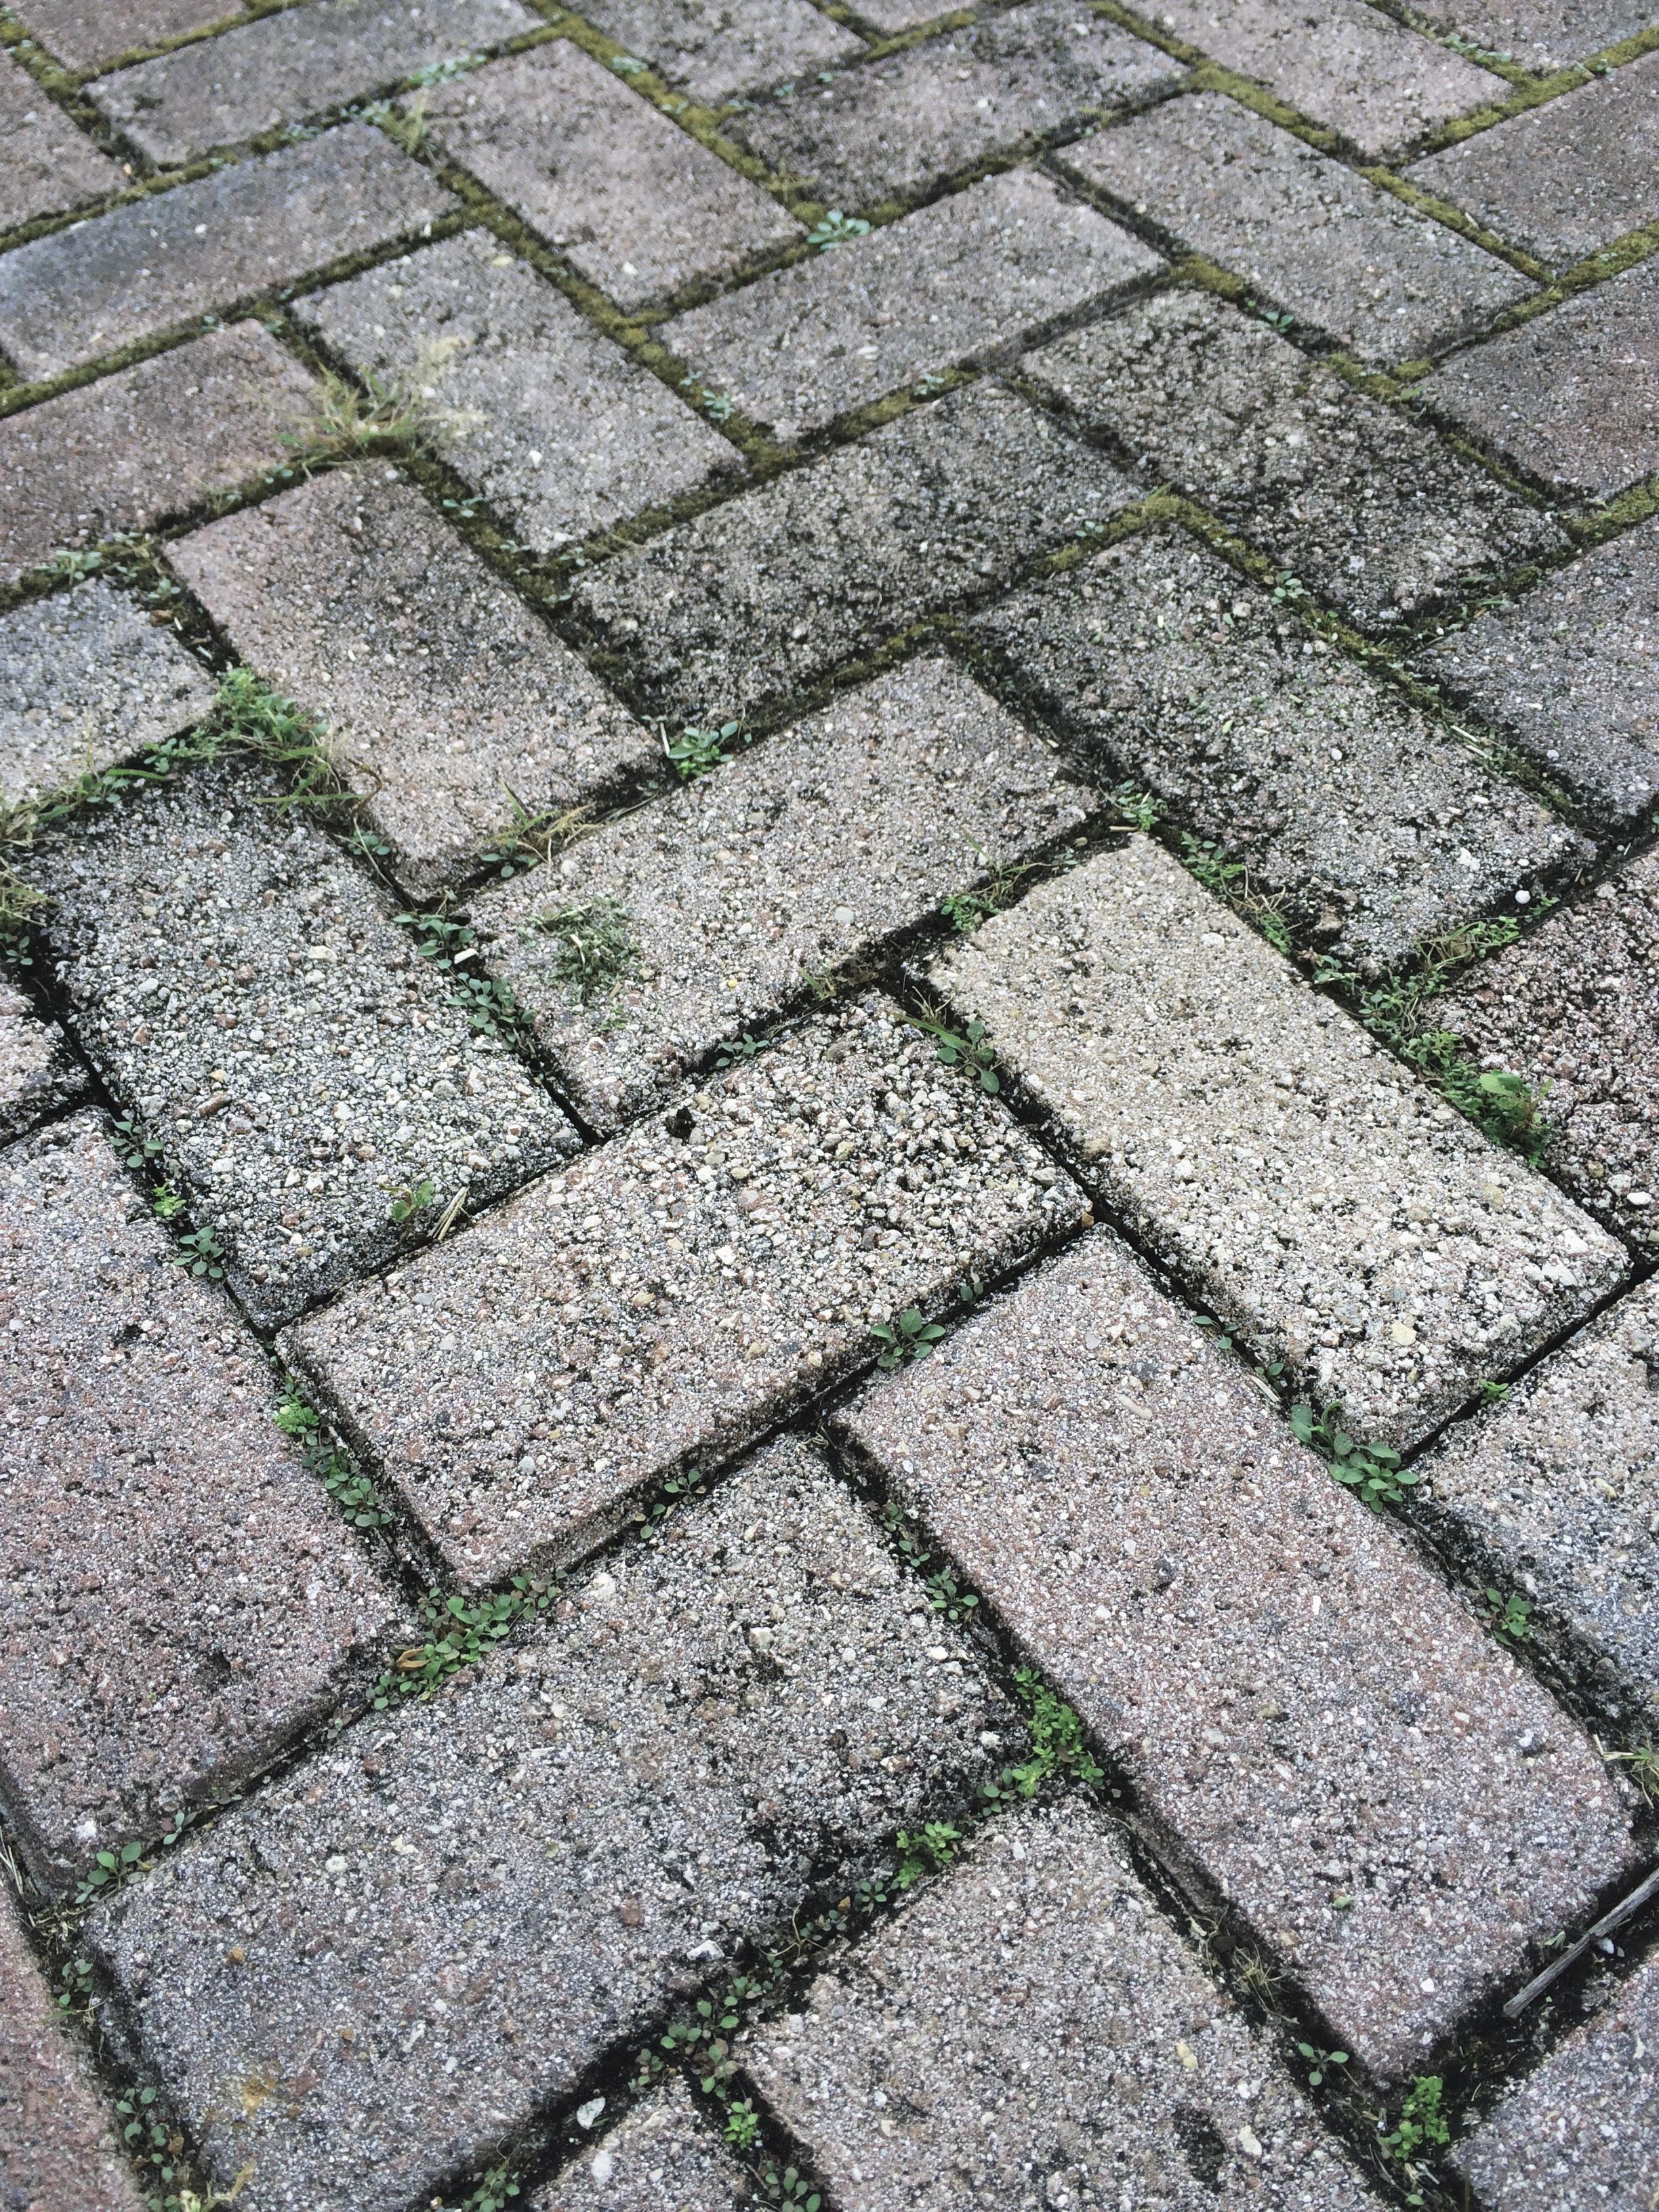 grass lawn sidewalk floor cobblestone wall asphalt walkway pattern soil stone wall brick lane material driveway